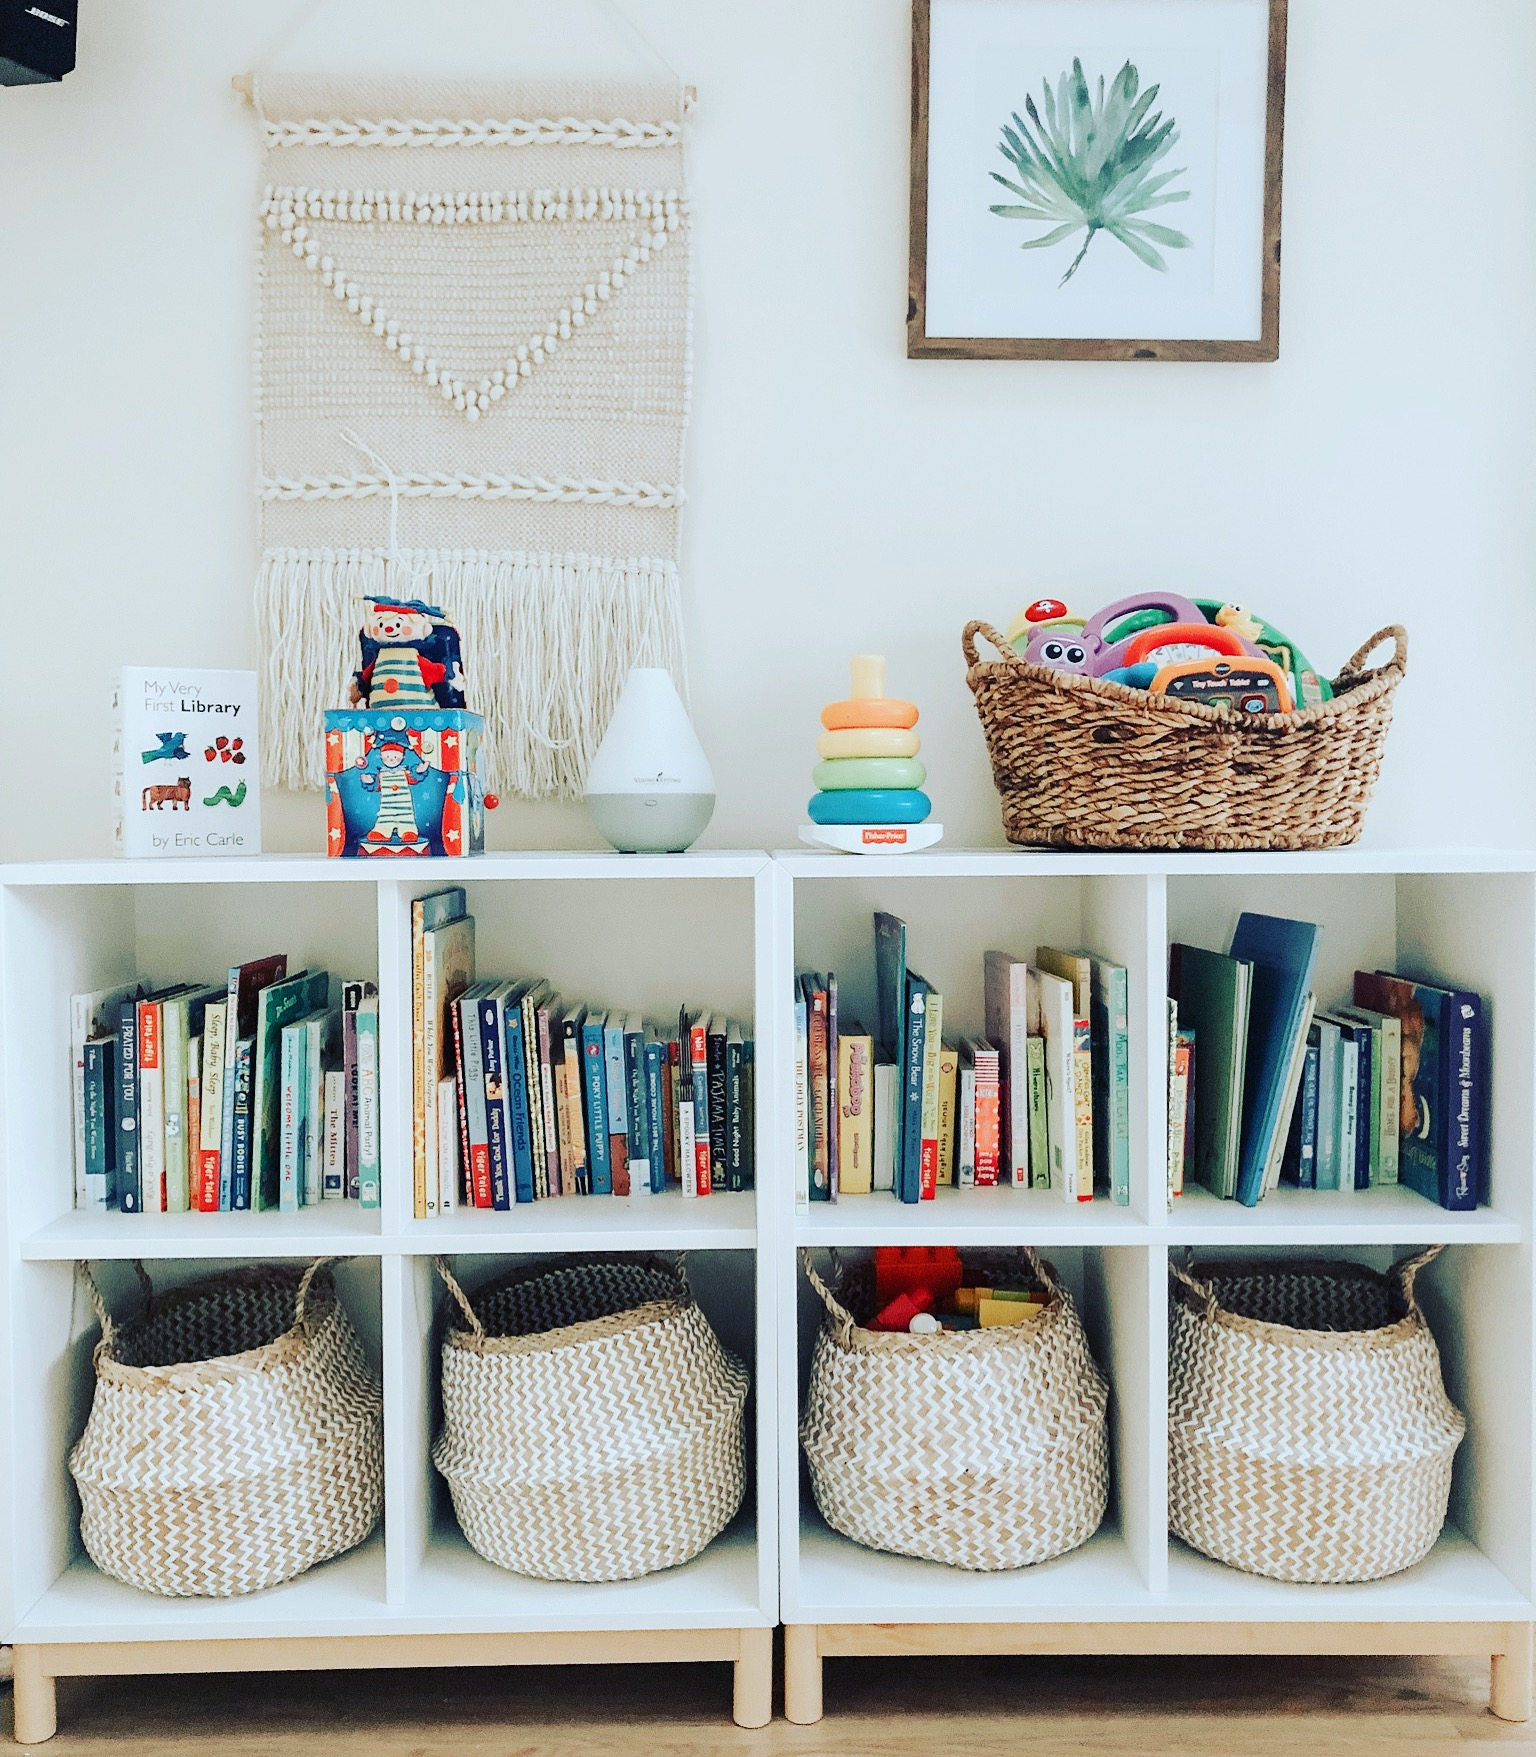 Shelving Unit  |  Baskets  |  Similar Baskets  |  Similar Art  |  Similar Art  |  Similar Tapestry  and  here  |  Similar Diffuser